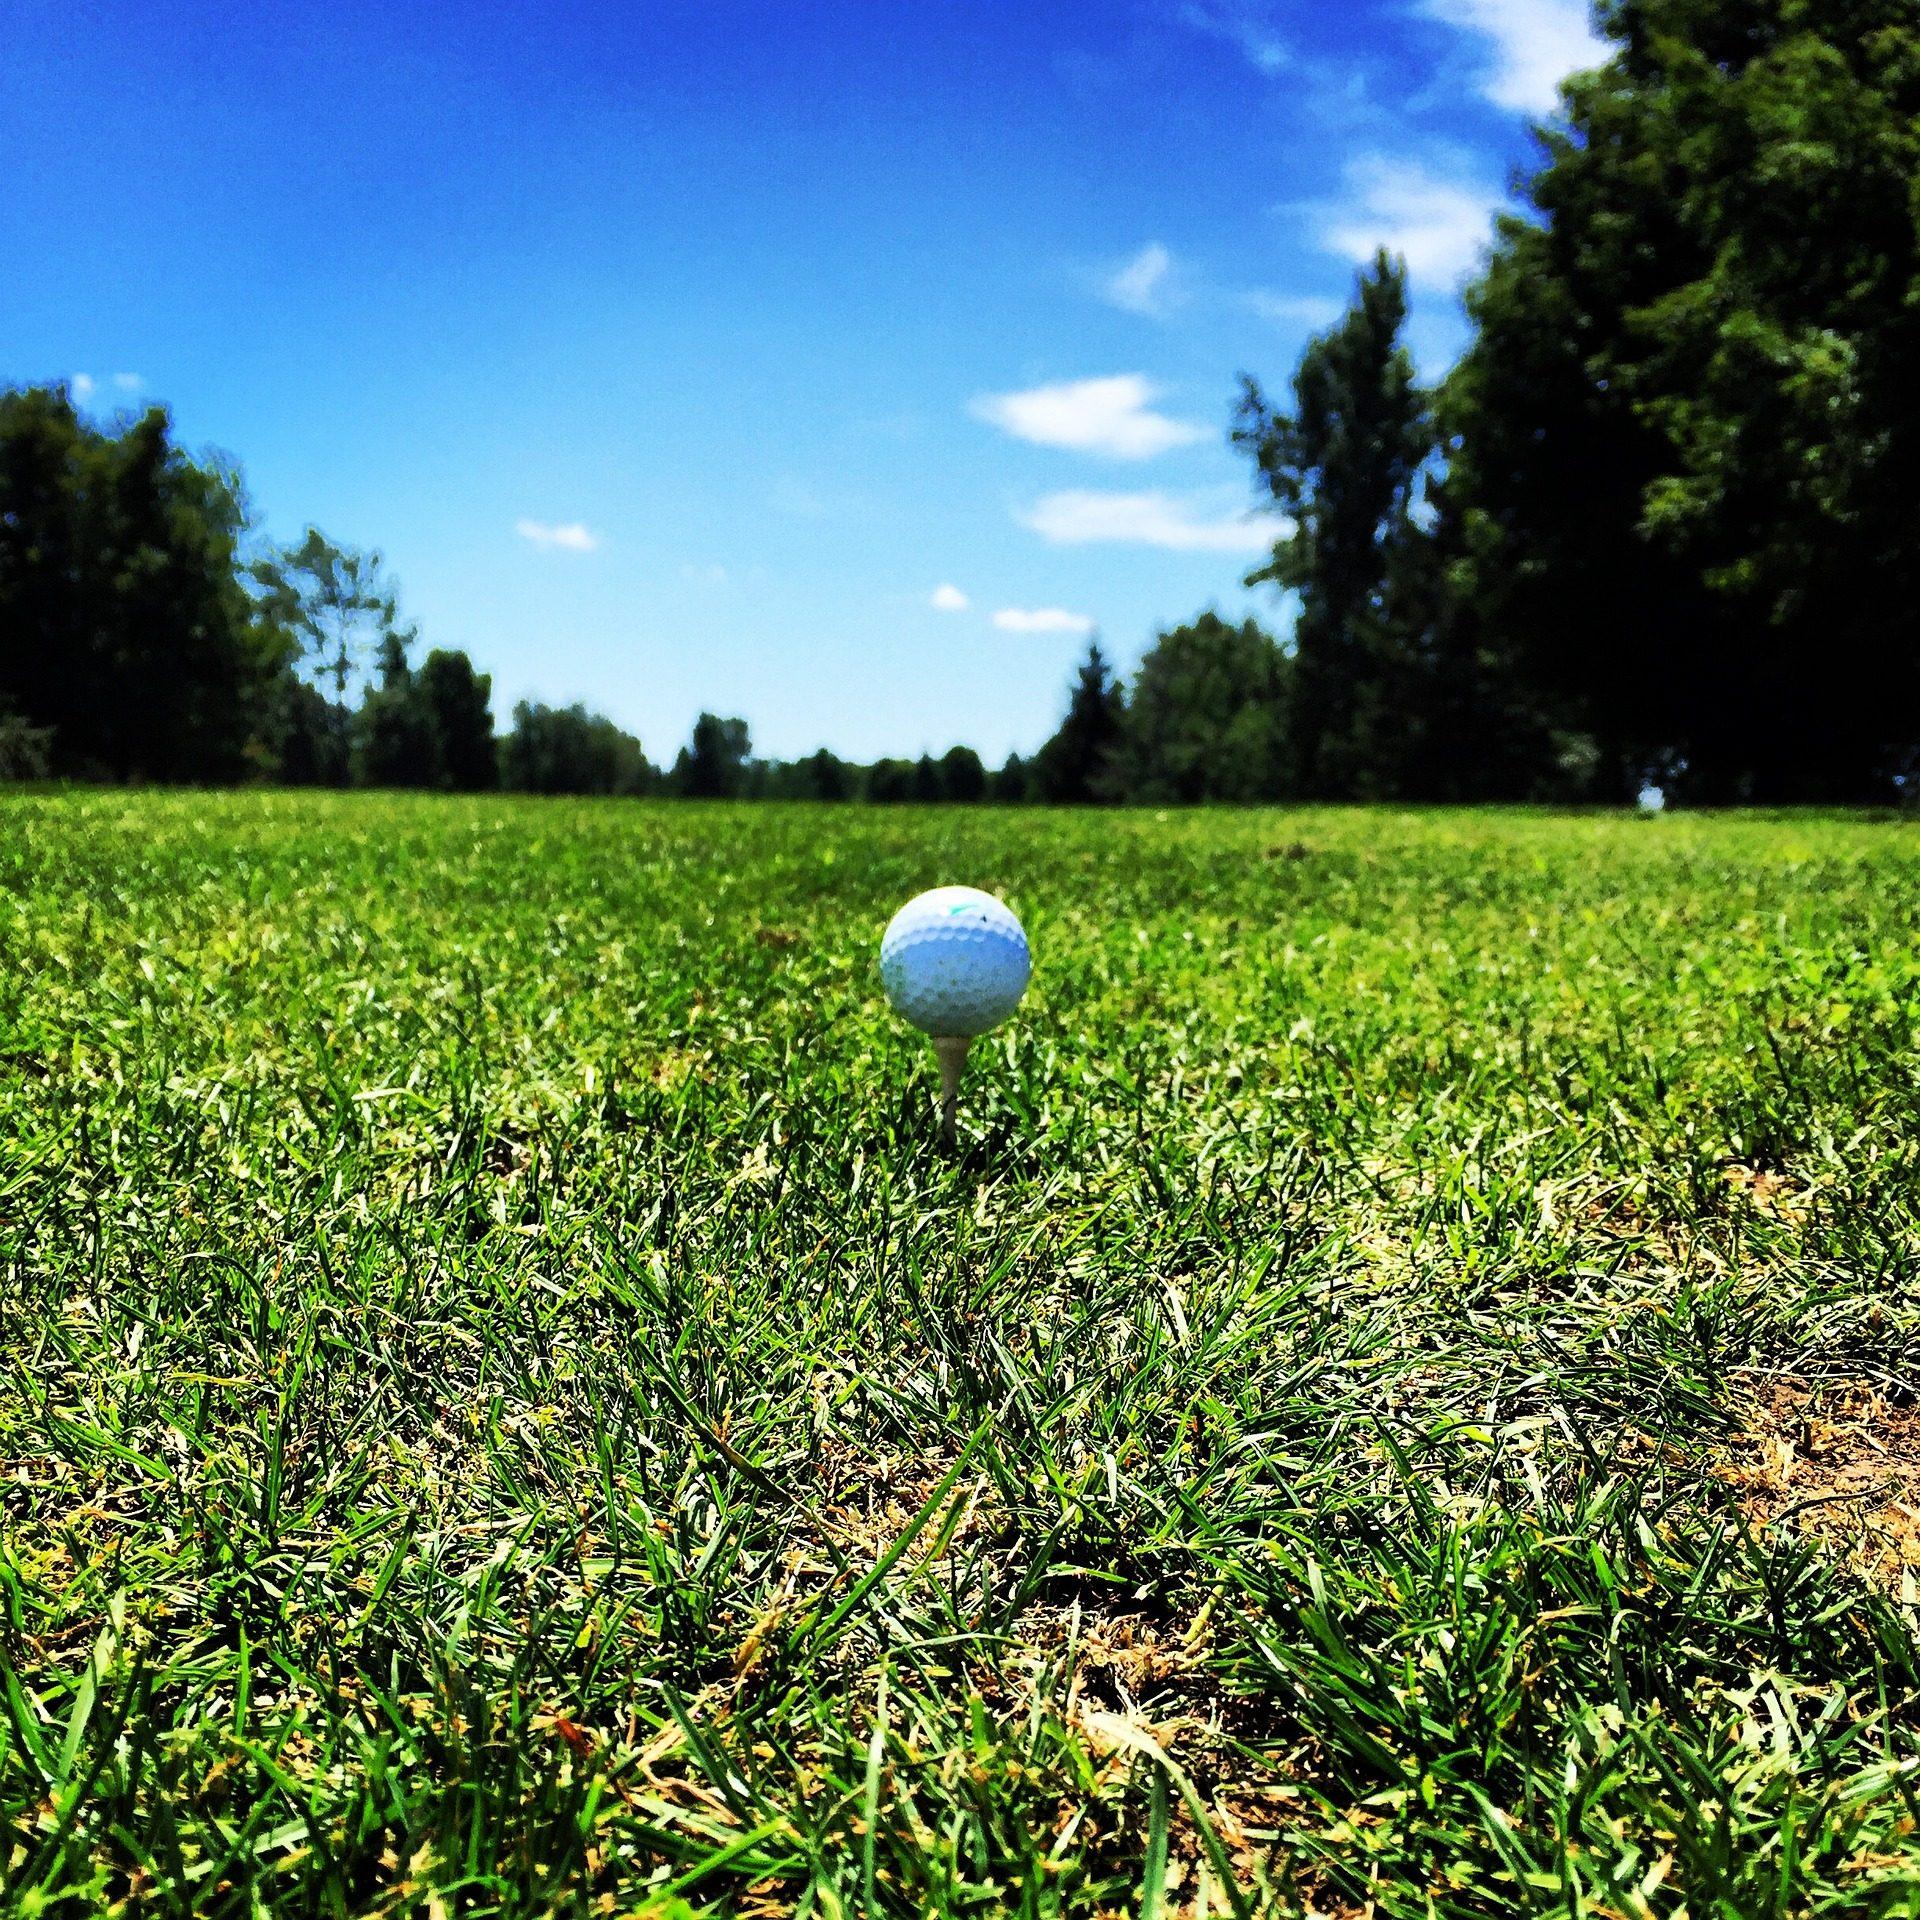 pelota, palla, campo, Golf, prato, alberi - Sfondi HD - Professor-falken.com